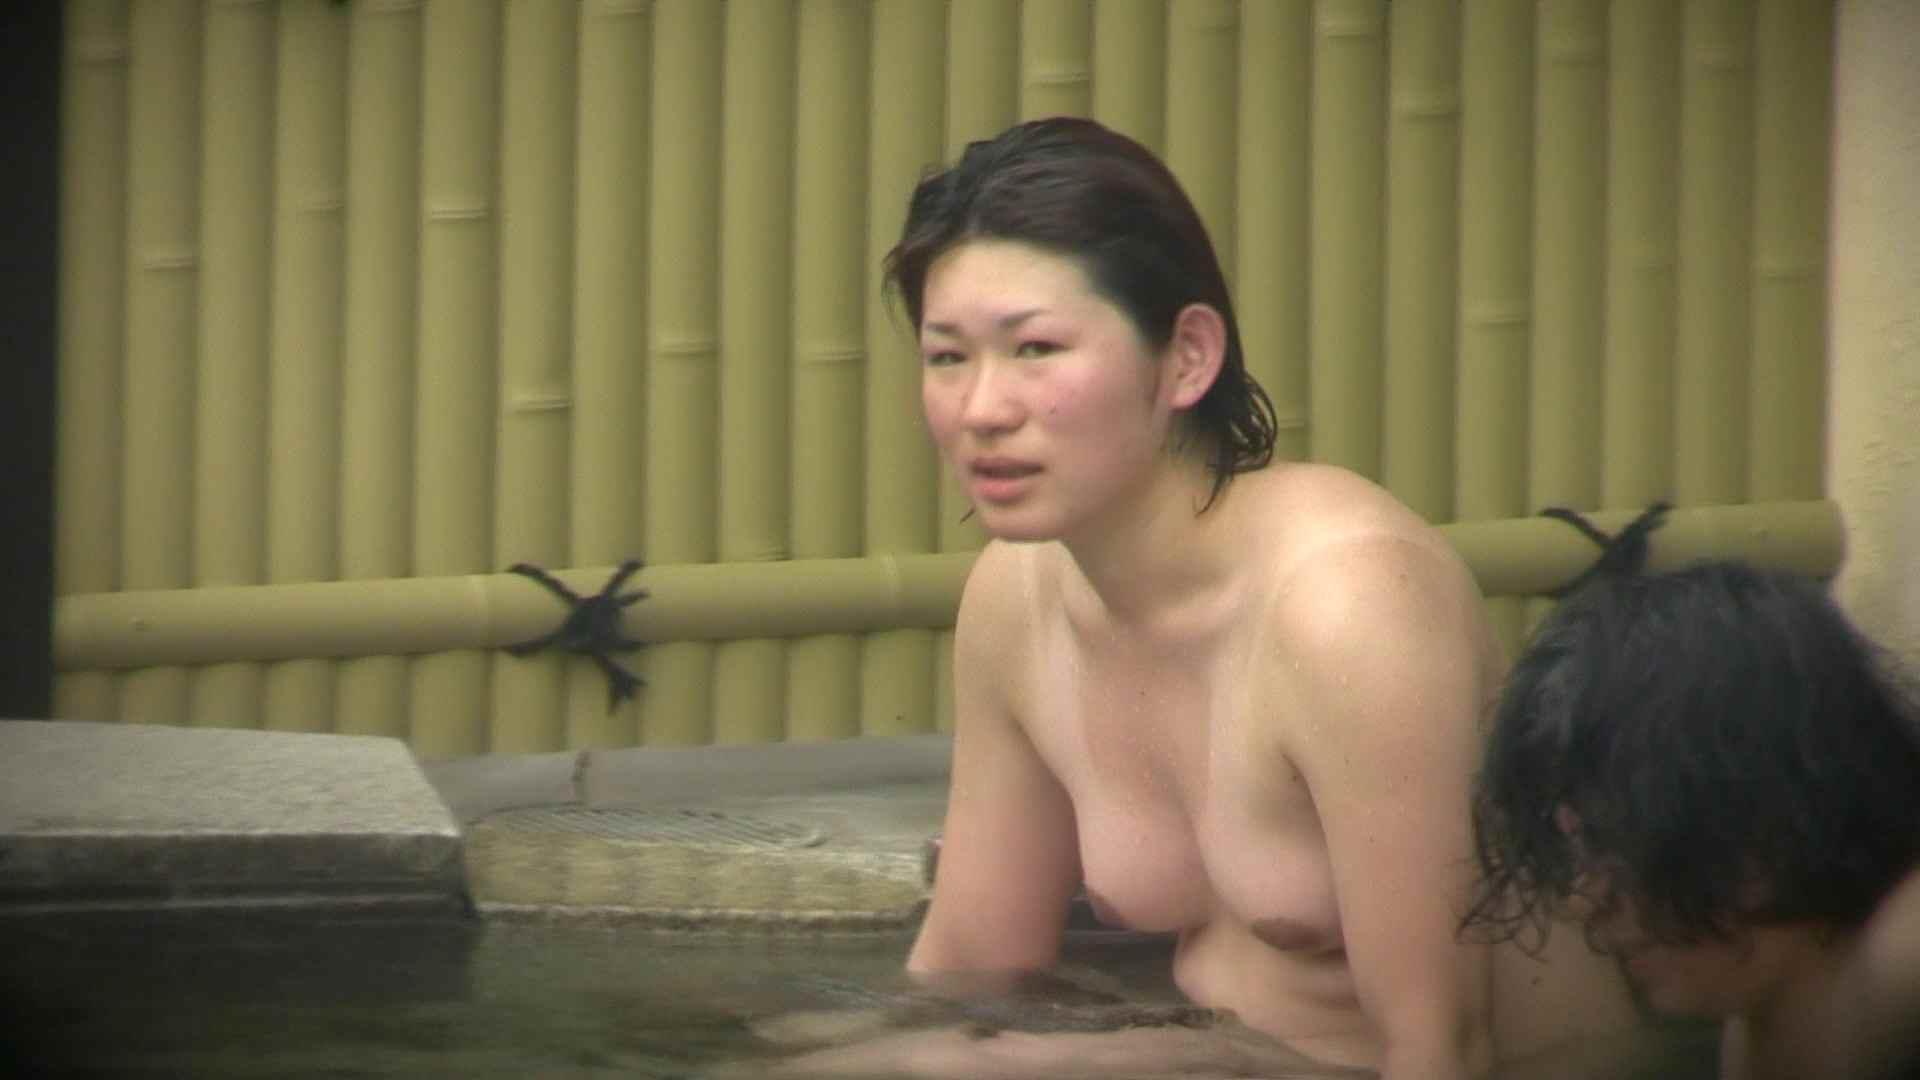 Aquaな露天風呂Vol.673 露天風呂 | OLのエロ生活  45連発 1